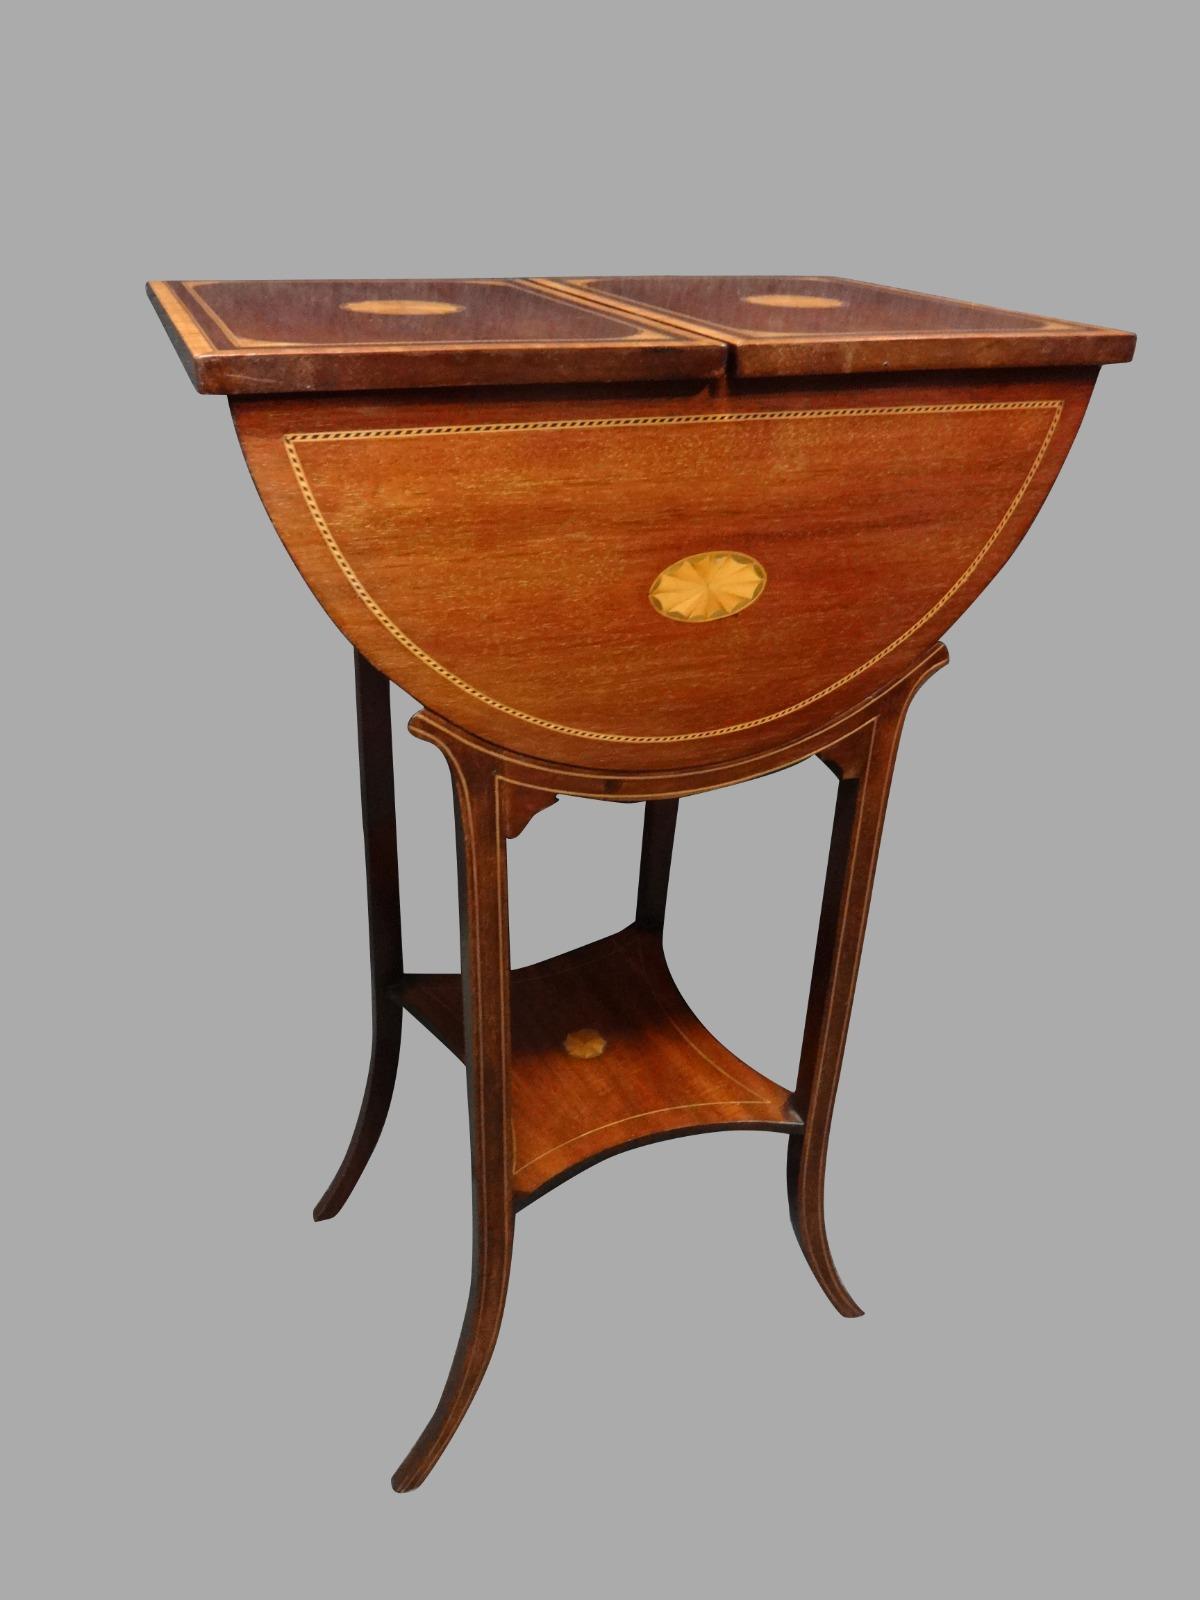 Edwardian Mahogany Inlaid Work Box (1 of 1)